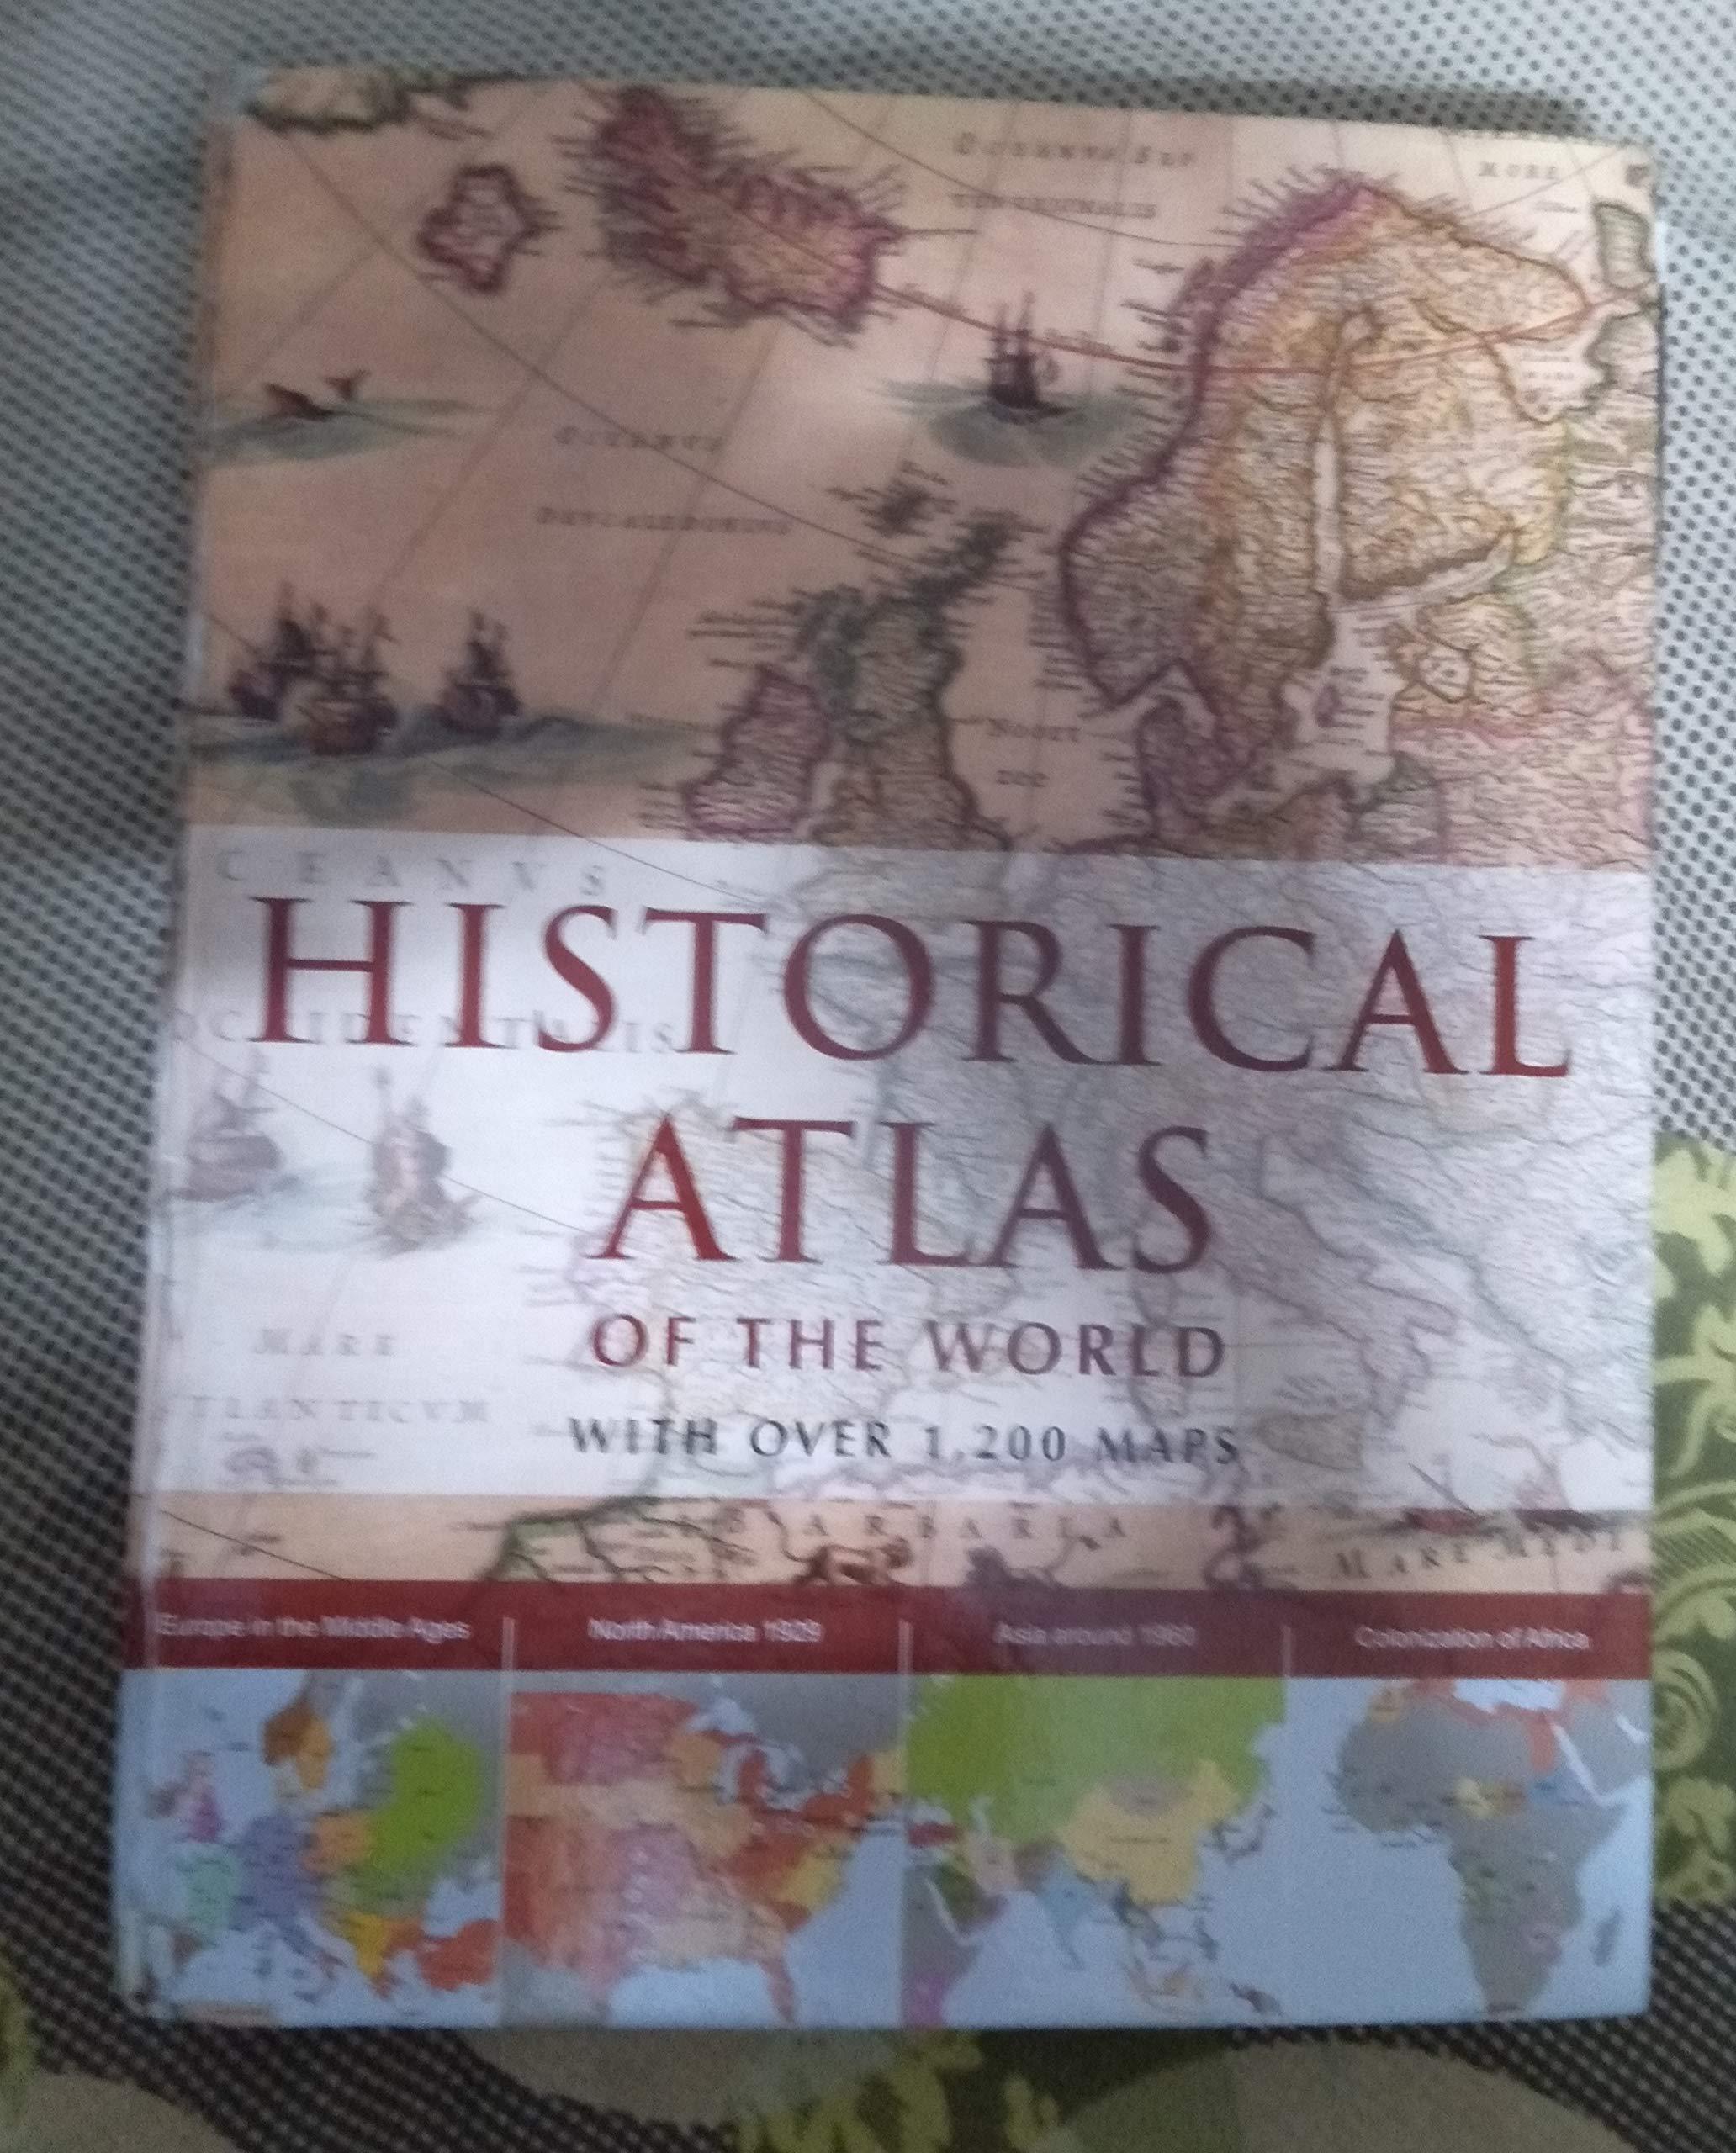 HISTORICAL ATLAS OF THE WORLD: Amazon.es: Ludwig Konemann: Libros en idiomas extranjeros